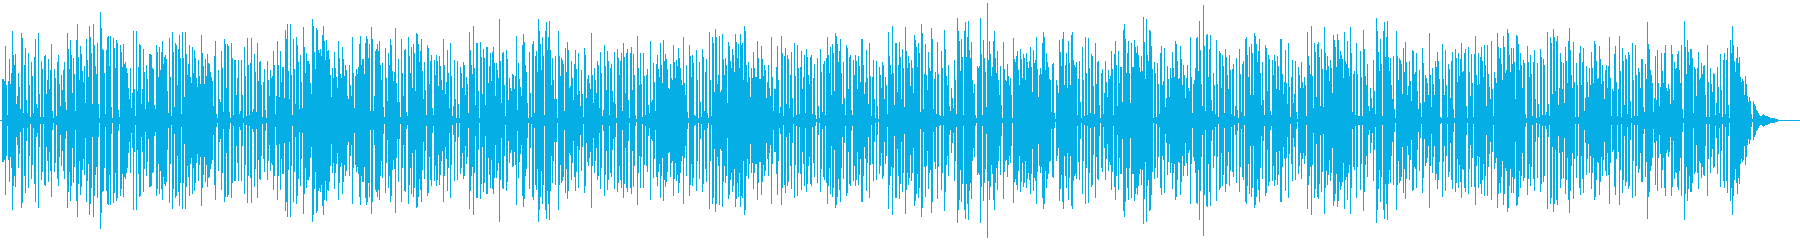 YouTube、おしゃれソロジャズピアノの再生済みの波形